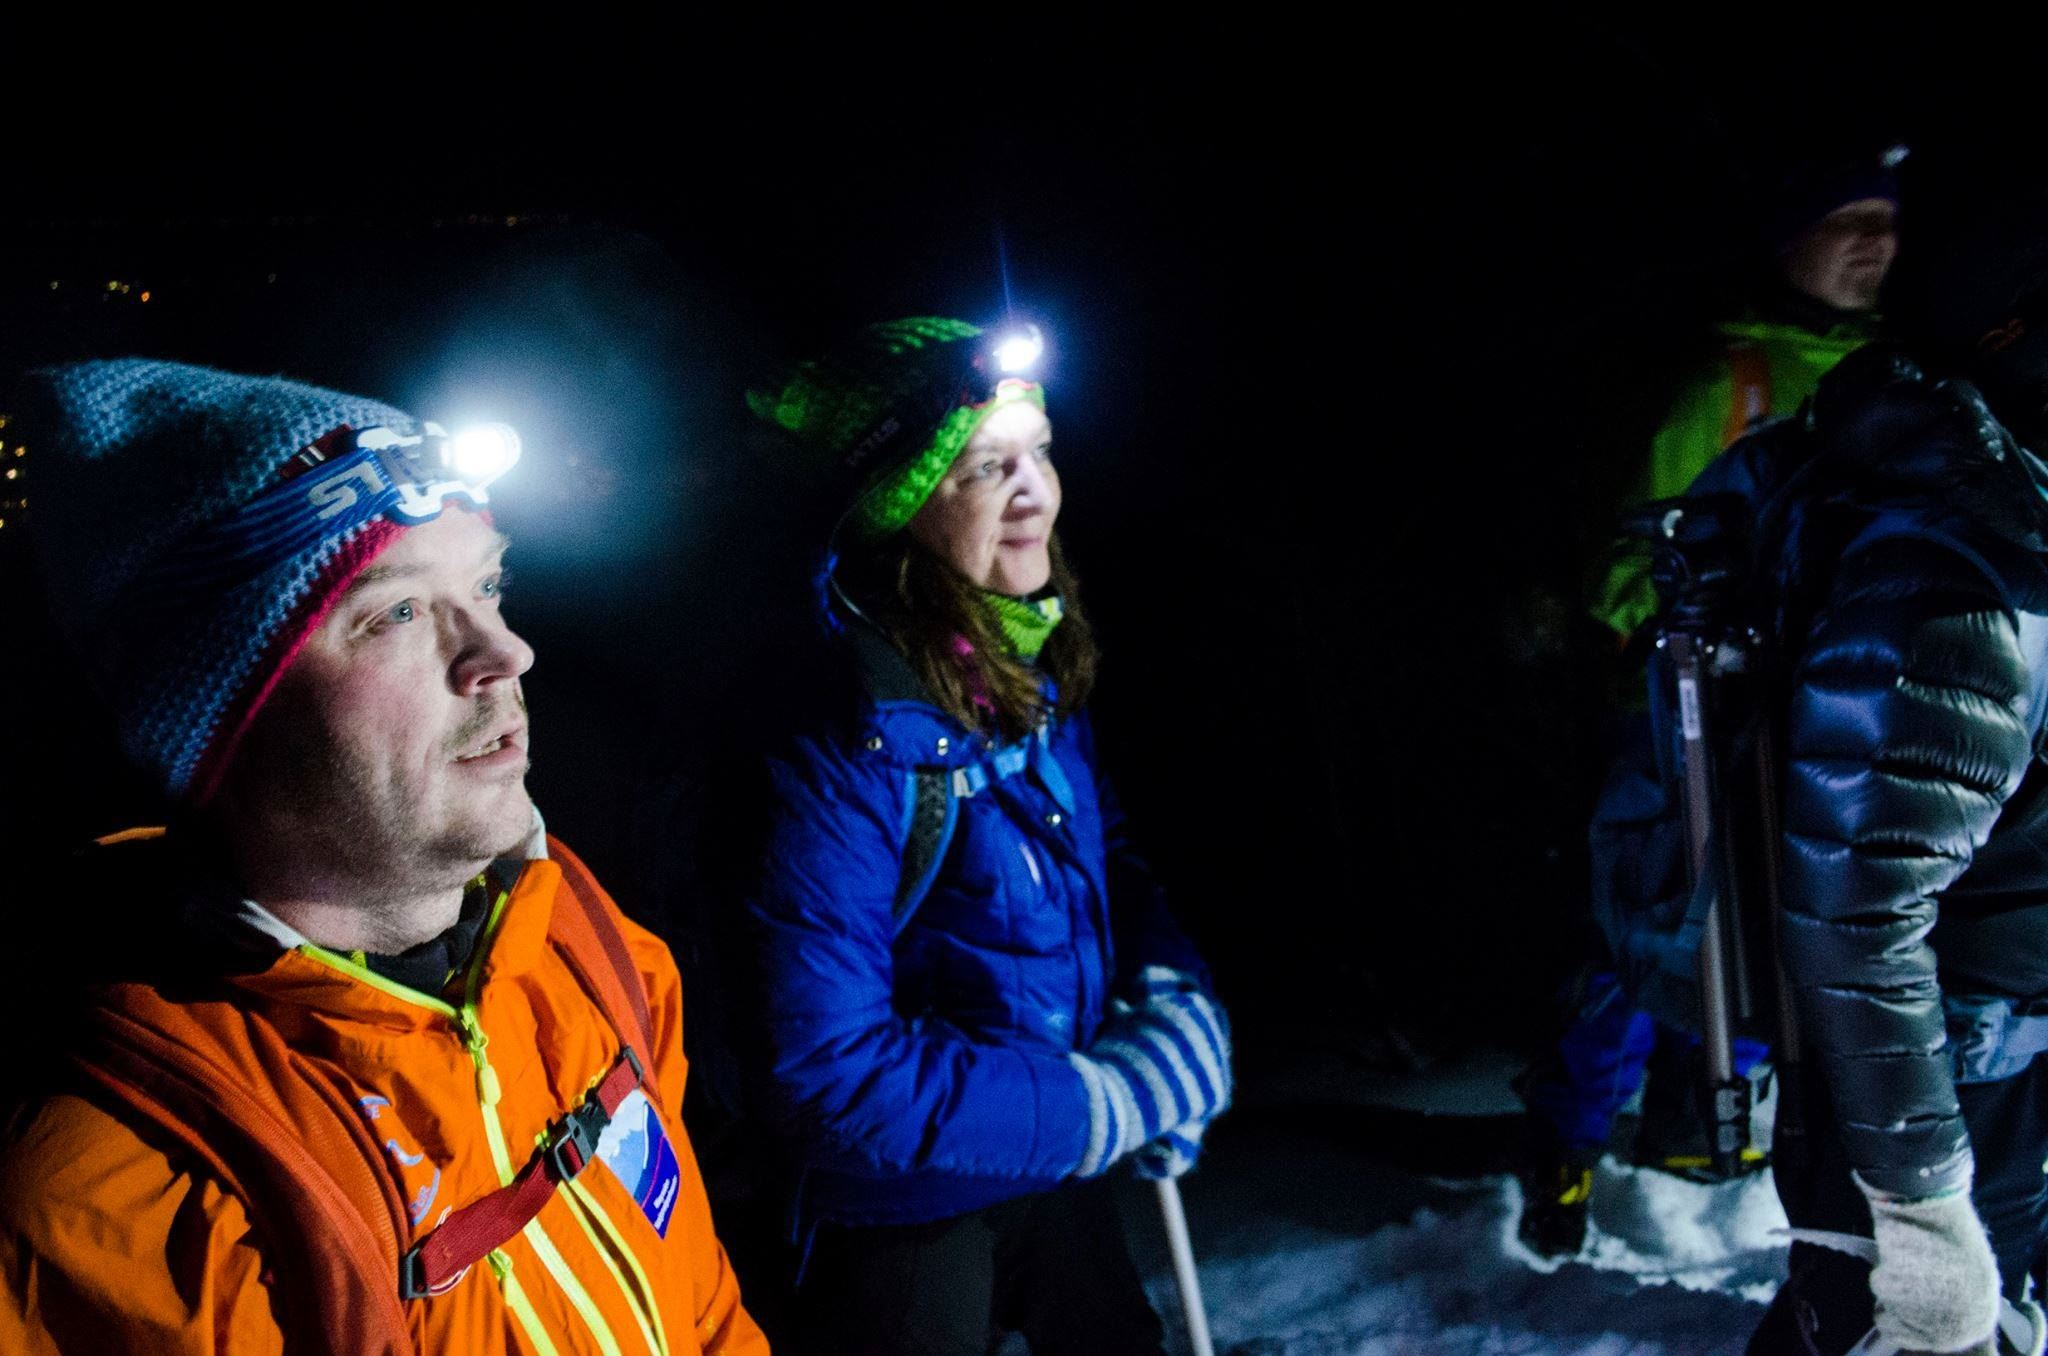 © Markedsbrygga, Guided wintertrips in Vesterålen nature - friluft.no